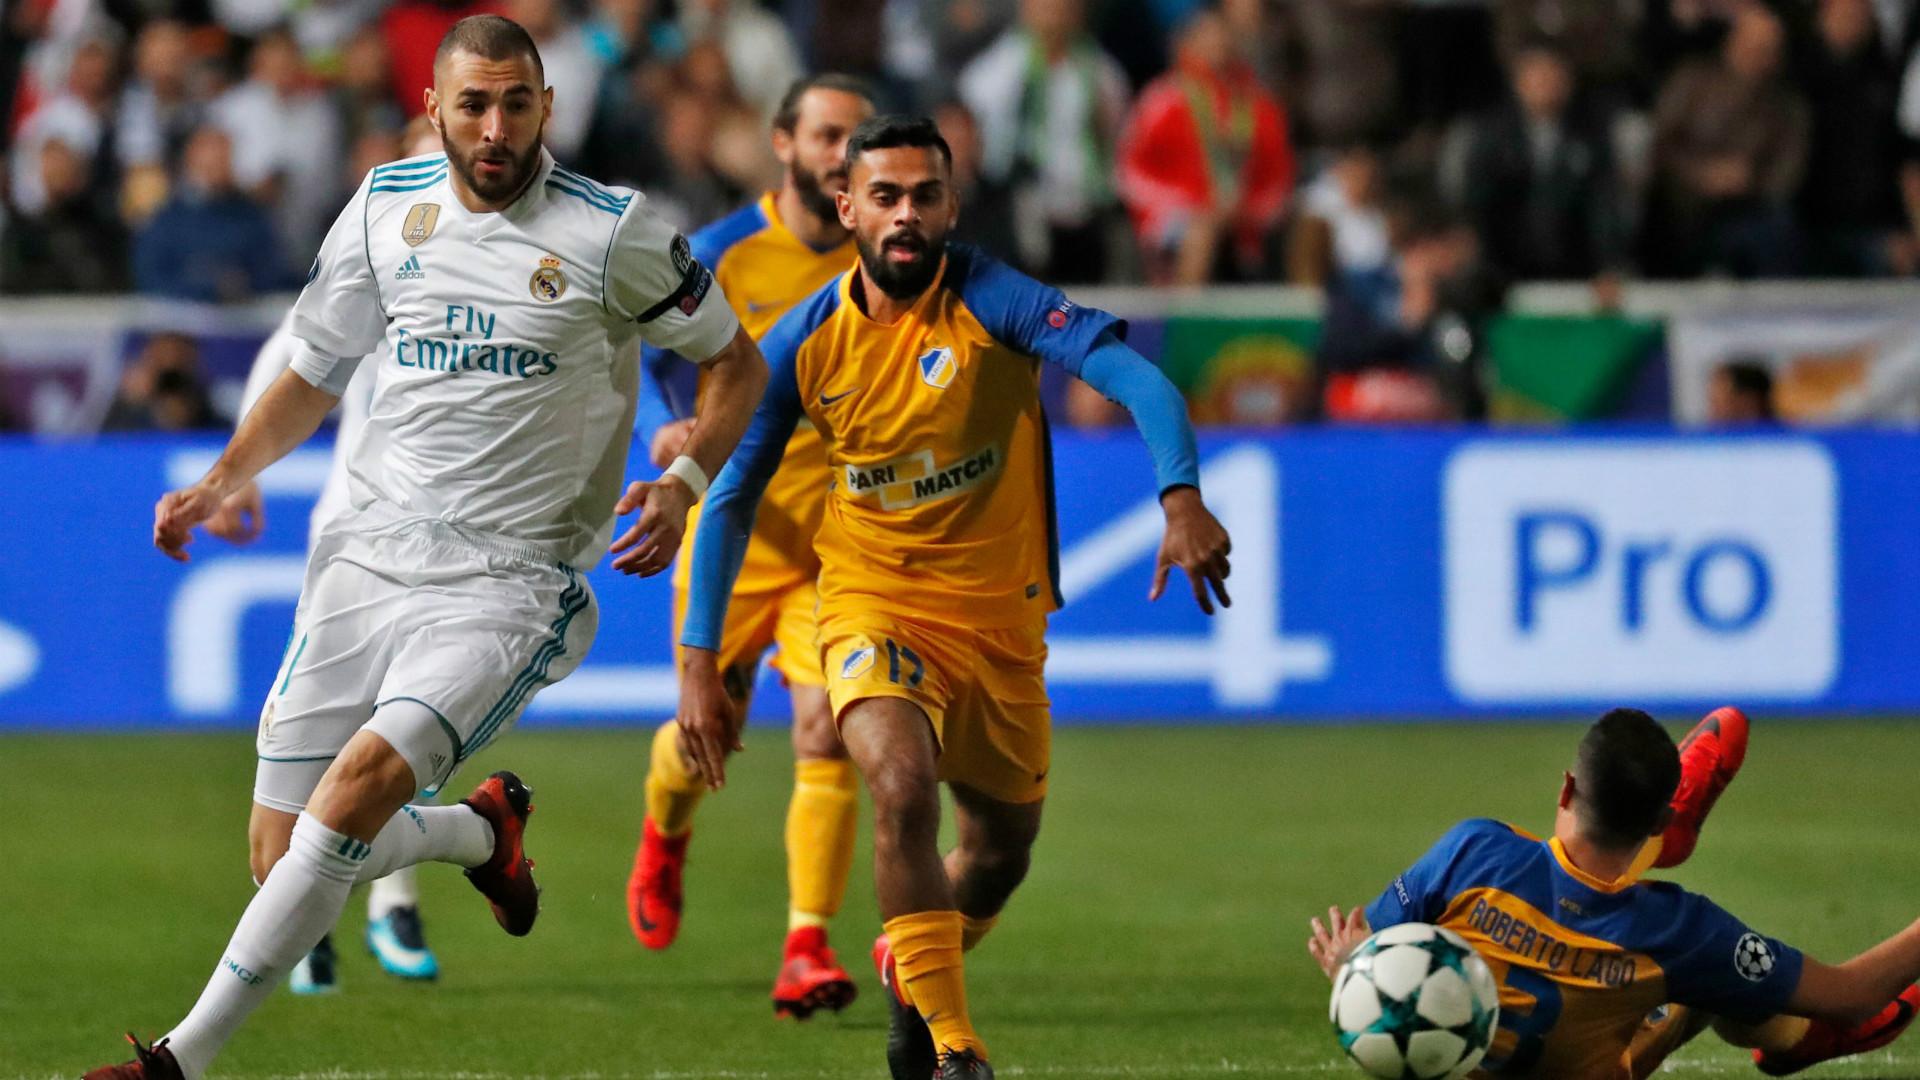 Karim Benzema APOEL Real Madrid Champions League